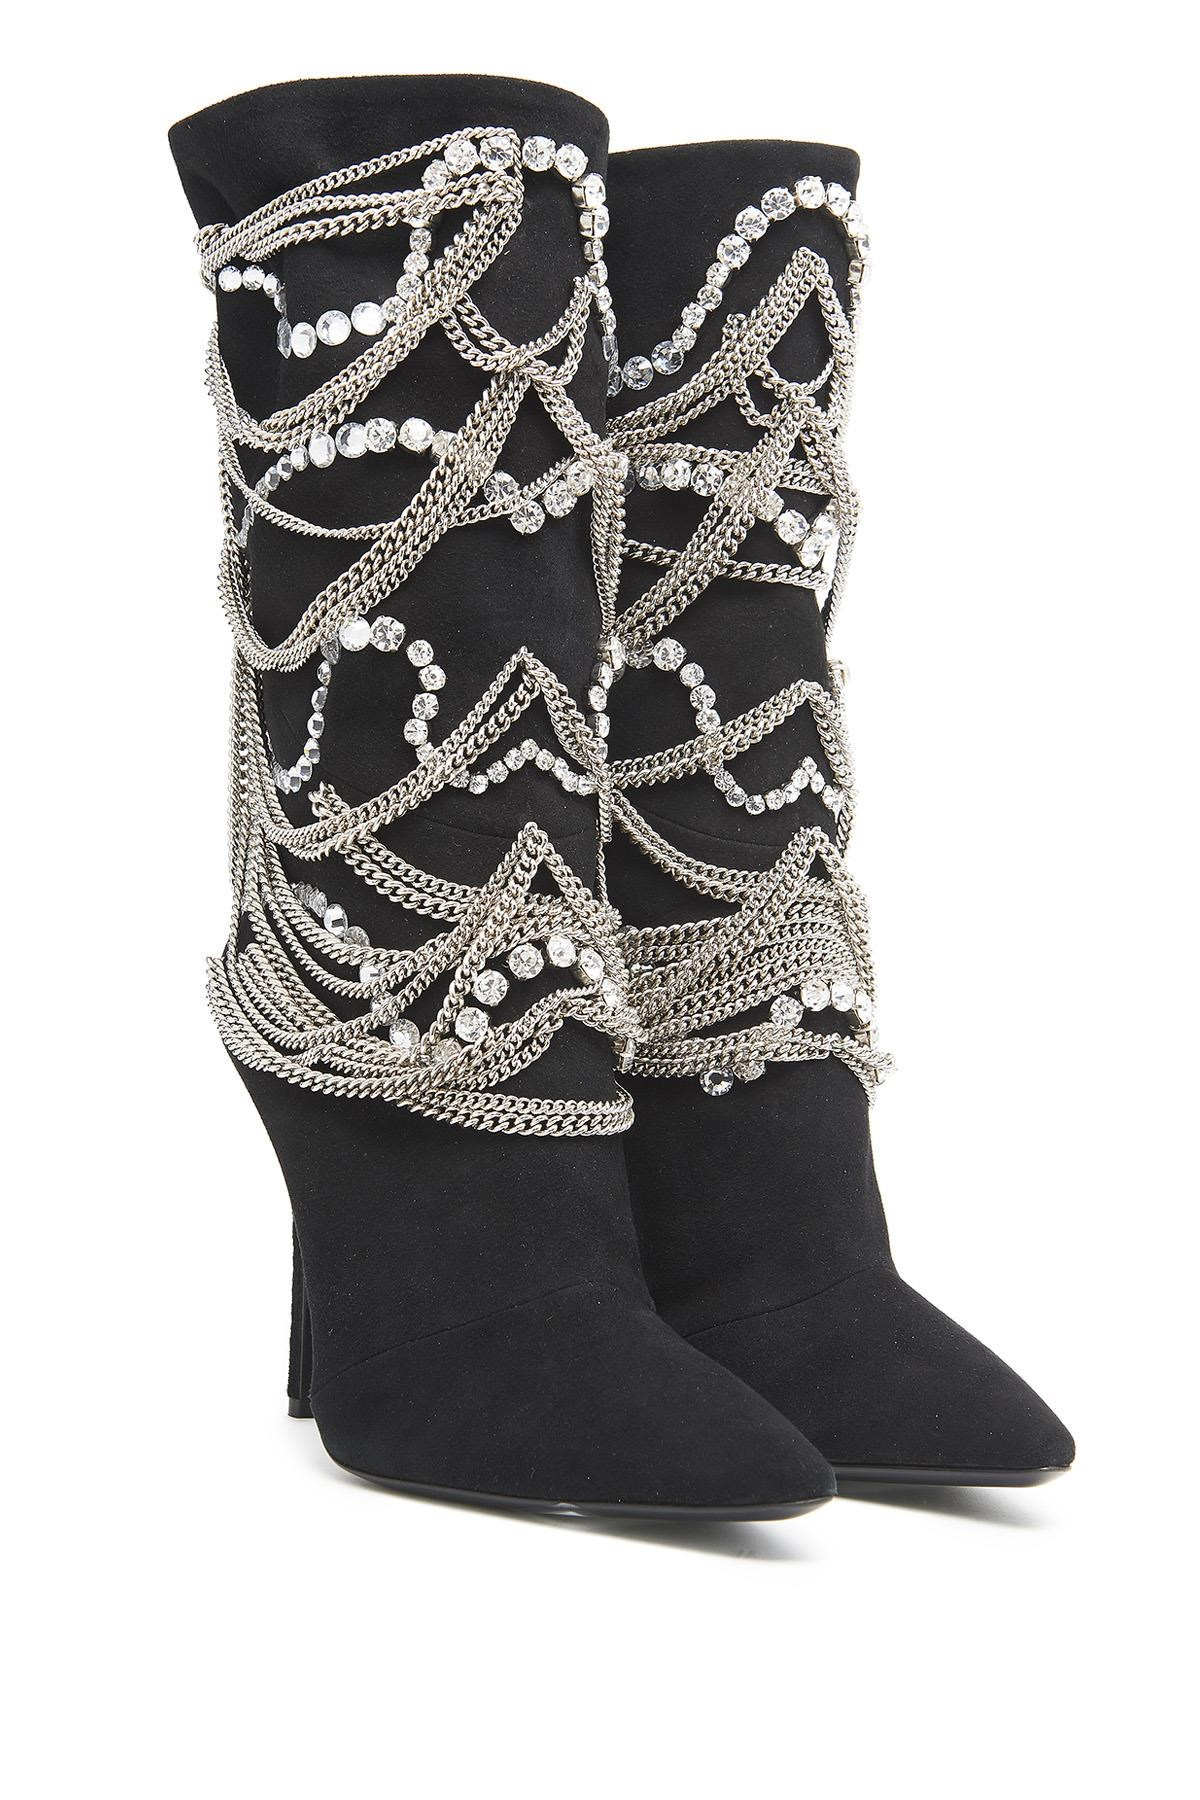 6330351541fca giuseppe zanotti 'notte' boots available on julian-fashion.com - 49097